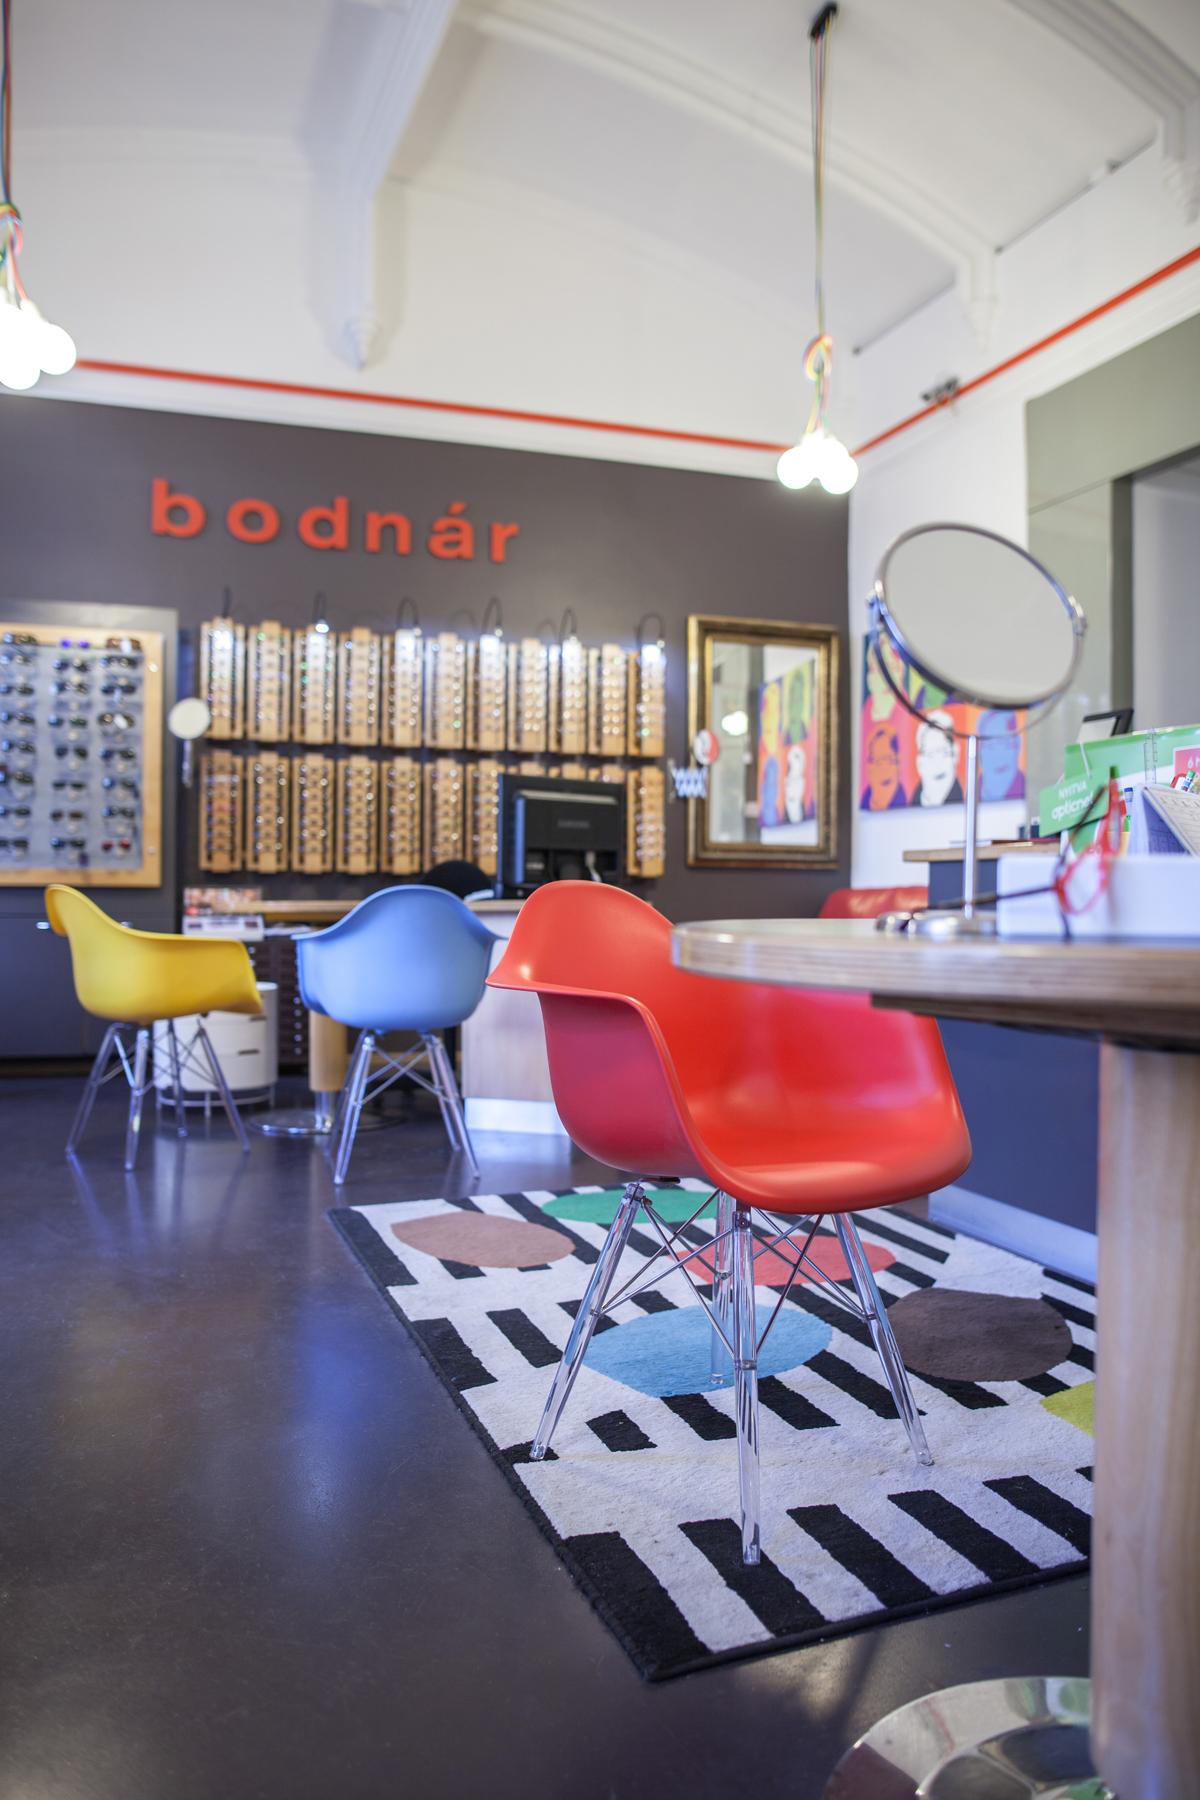 Pop art optikai üzlet Sopron - Lakberendezés Sopron - dothome 3891ced7c9